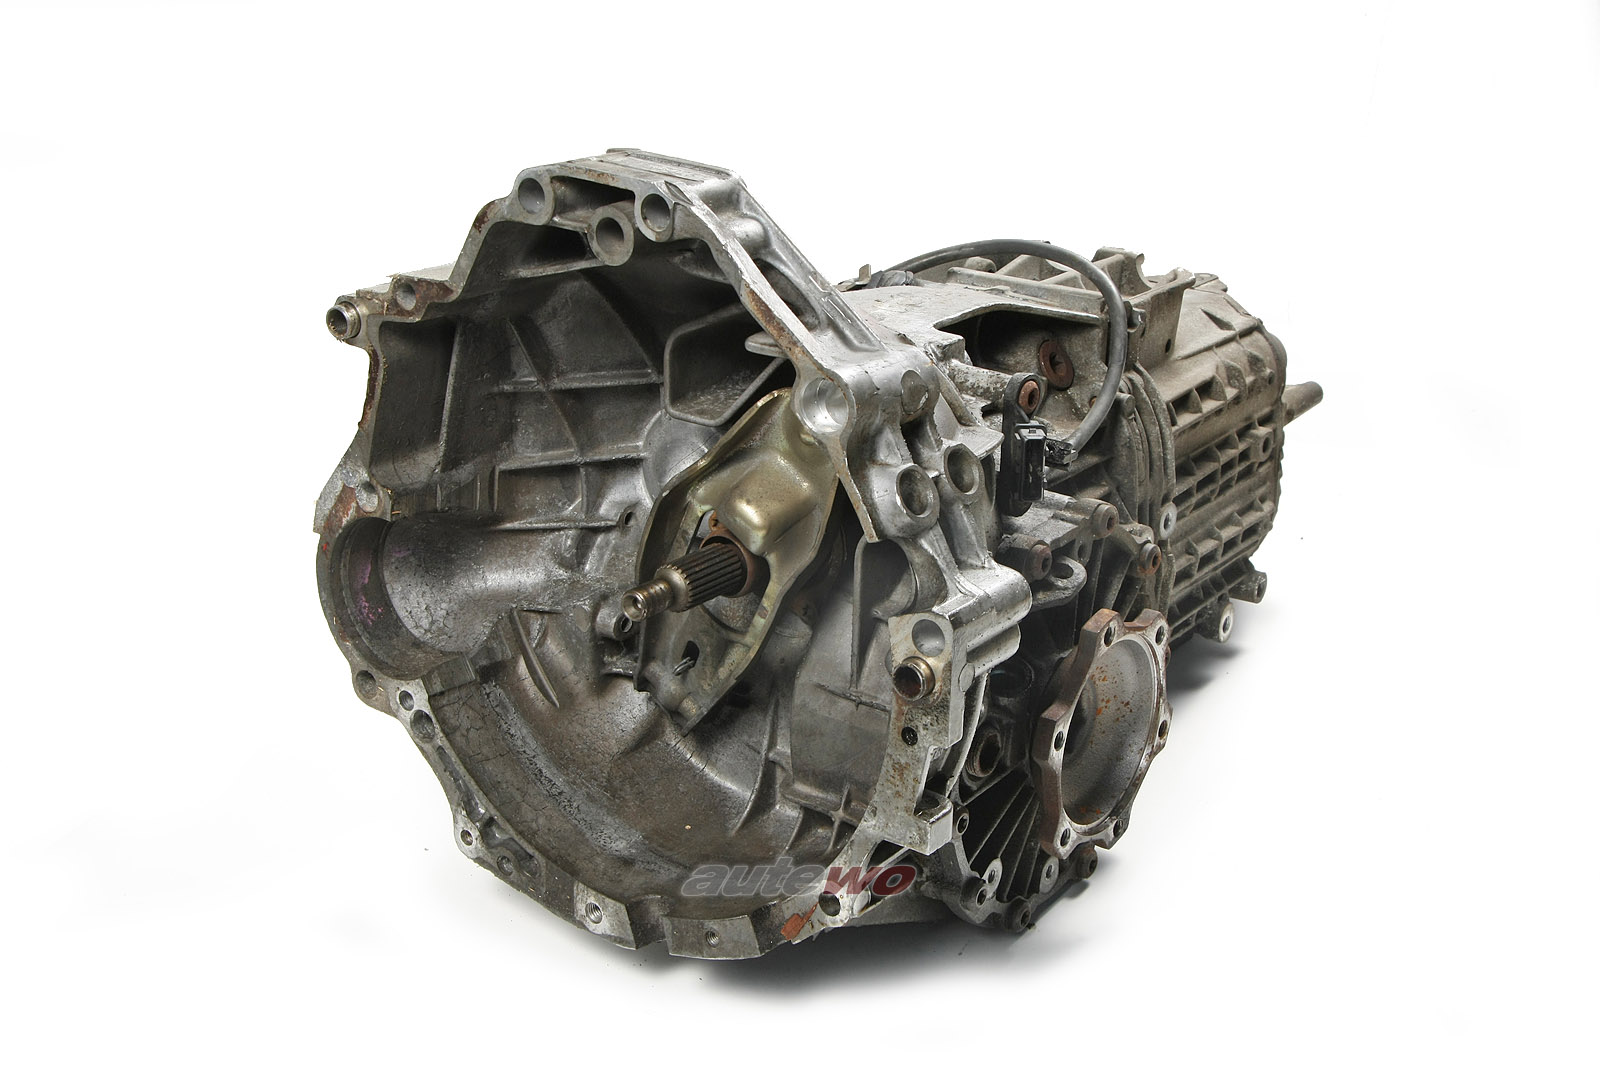 012300048FX Audi 80 B4/Coupe/Cabrio Typ 89/A6 C4 2.6l Getriebe 5-Gang CPE 03026